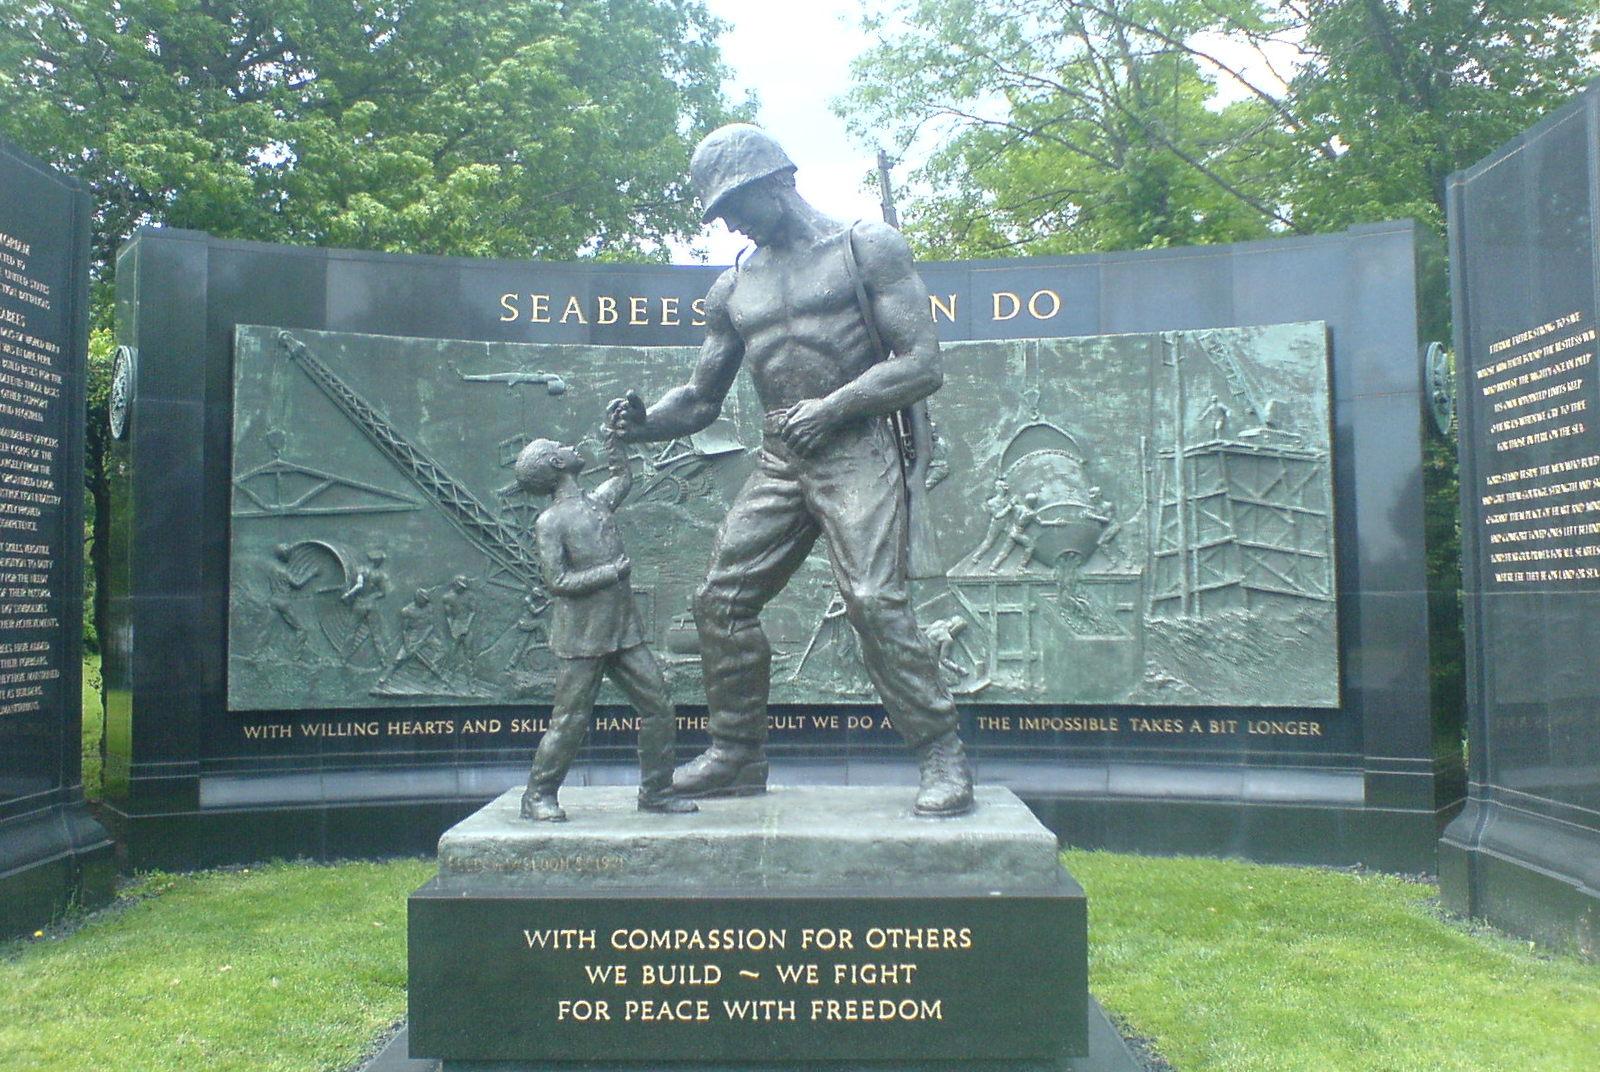 Seabees memorial